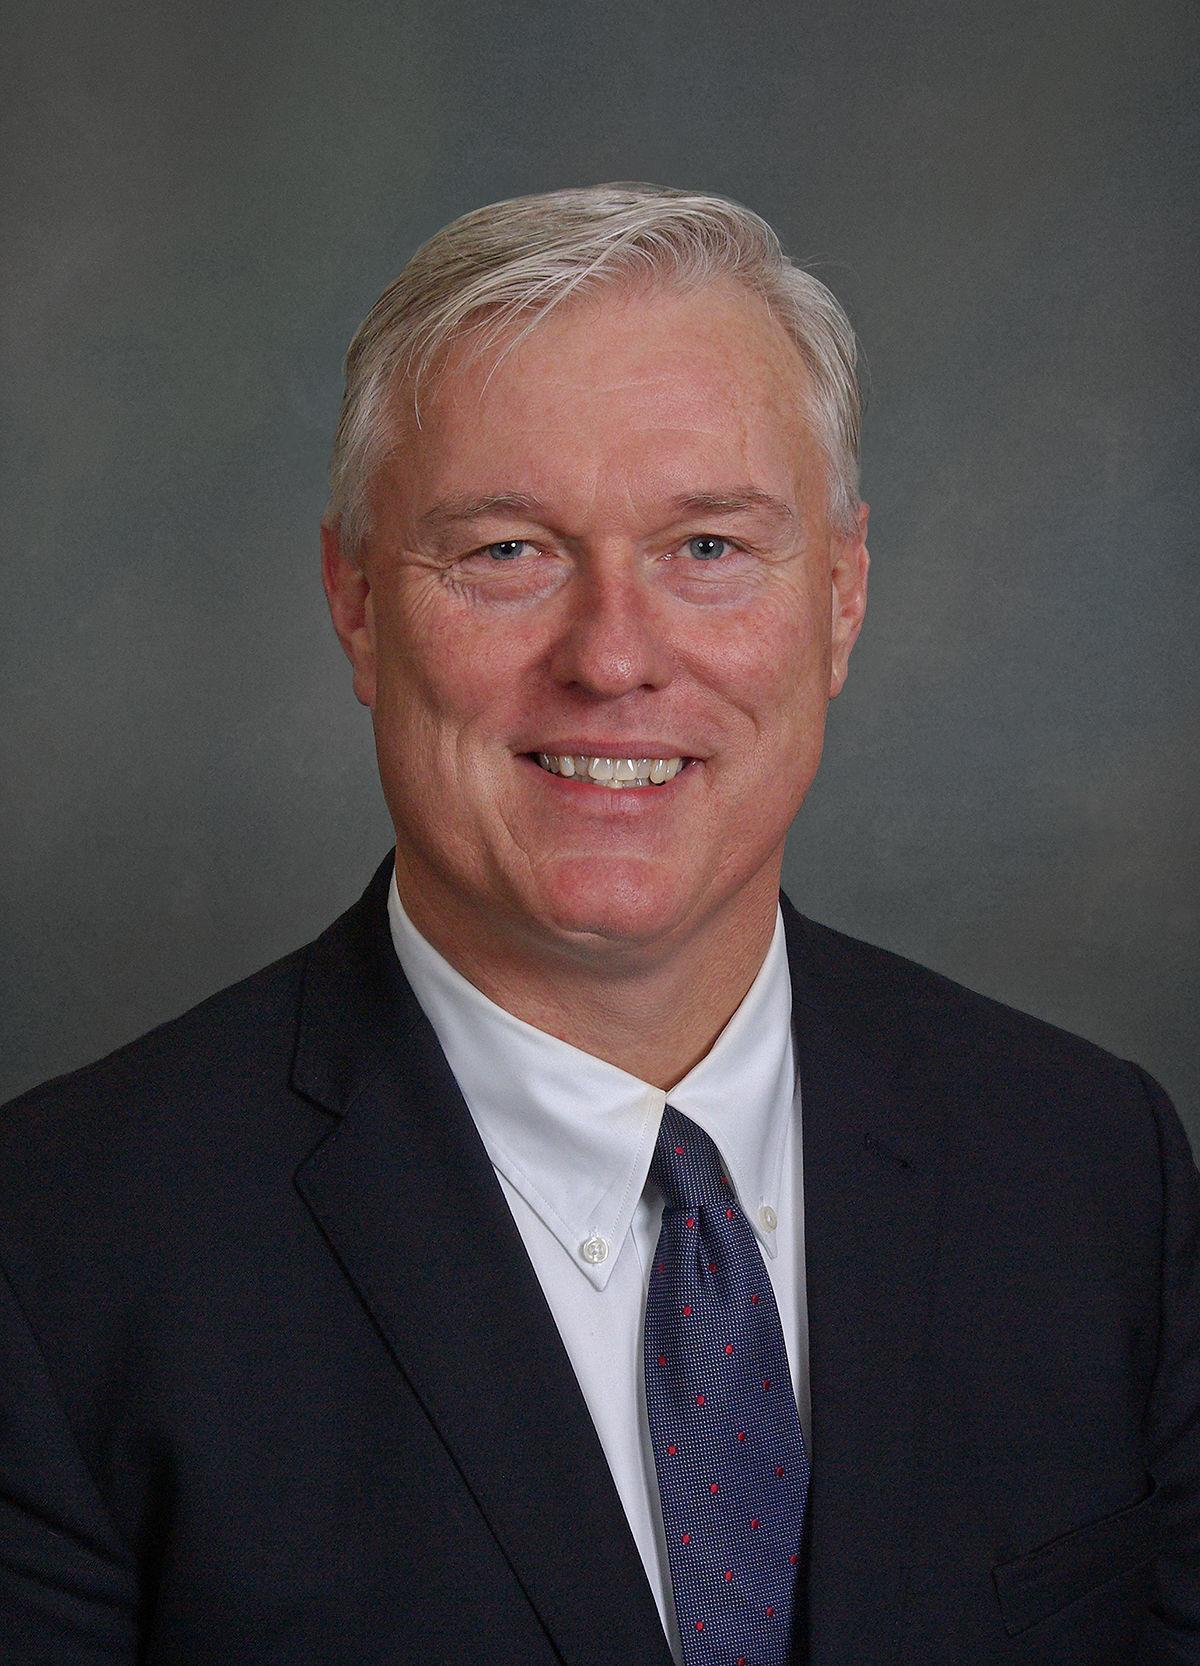 Dr. Mark Church, Superintendent